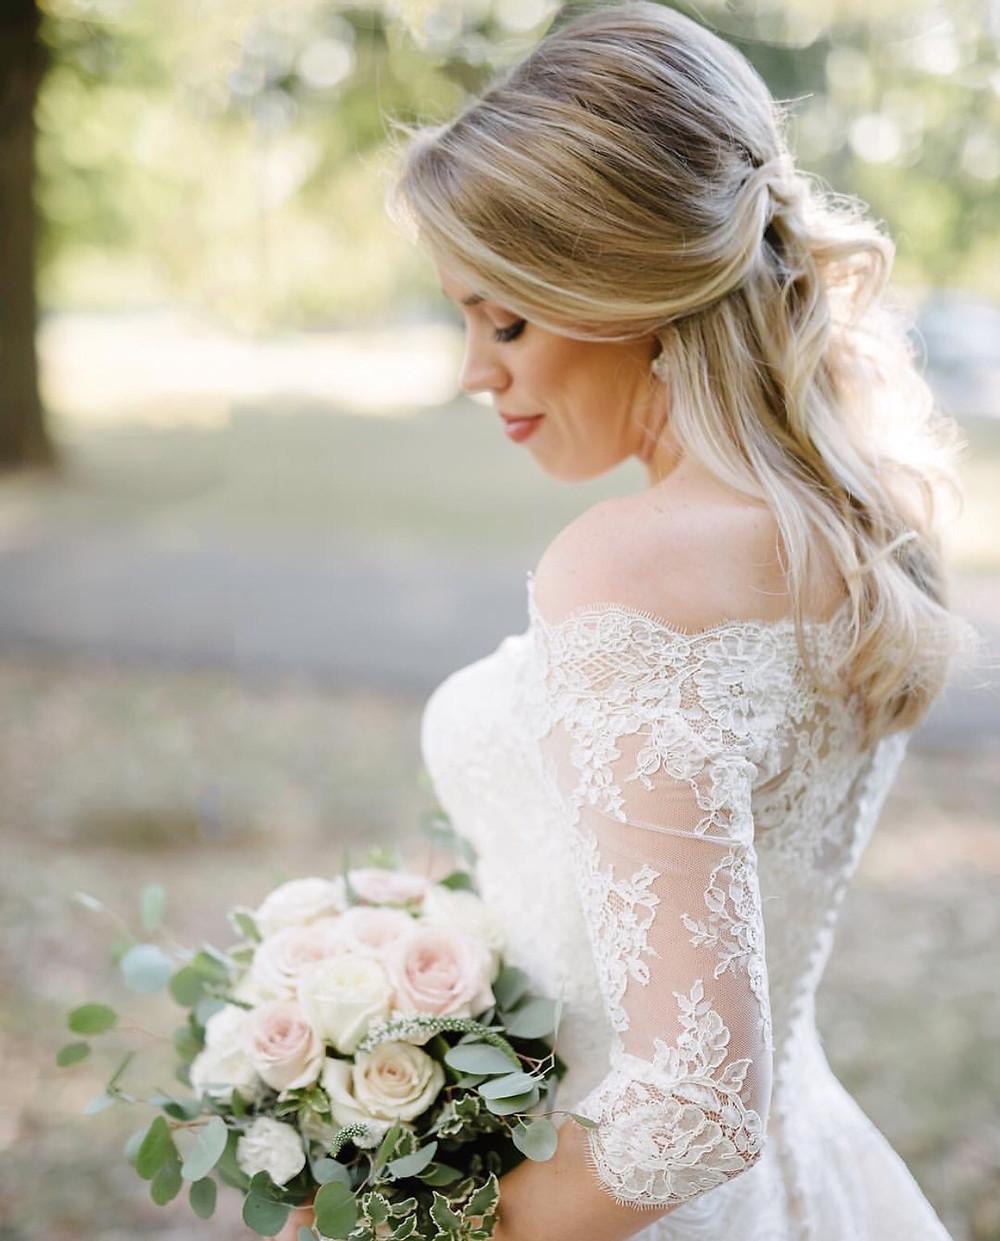 Eden Ingle Photo - Bride in Lace